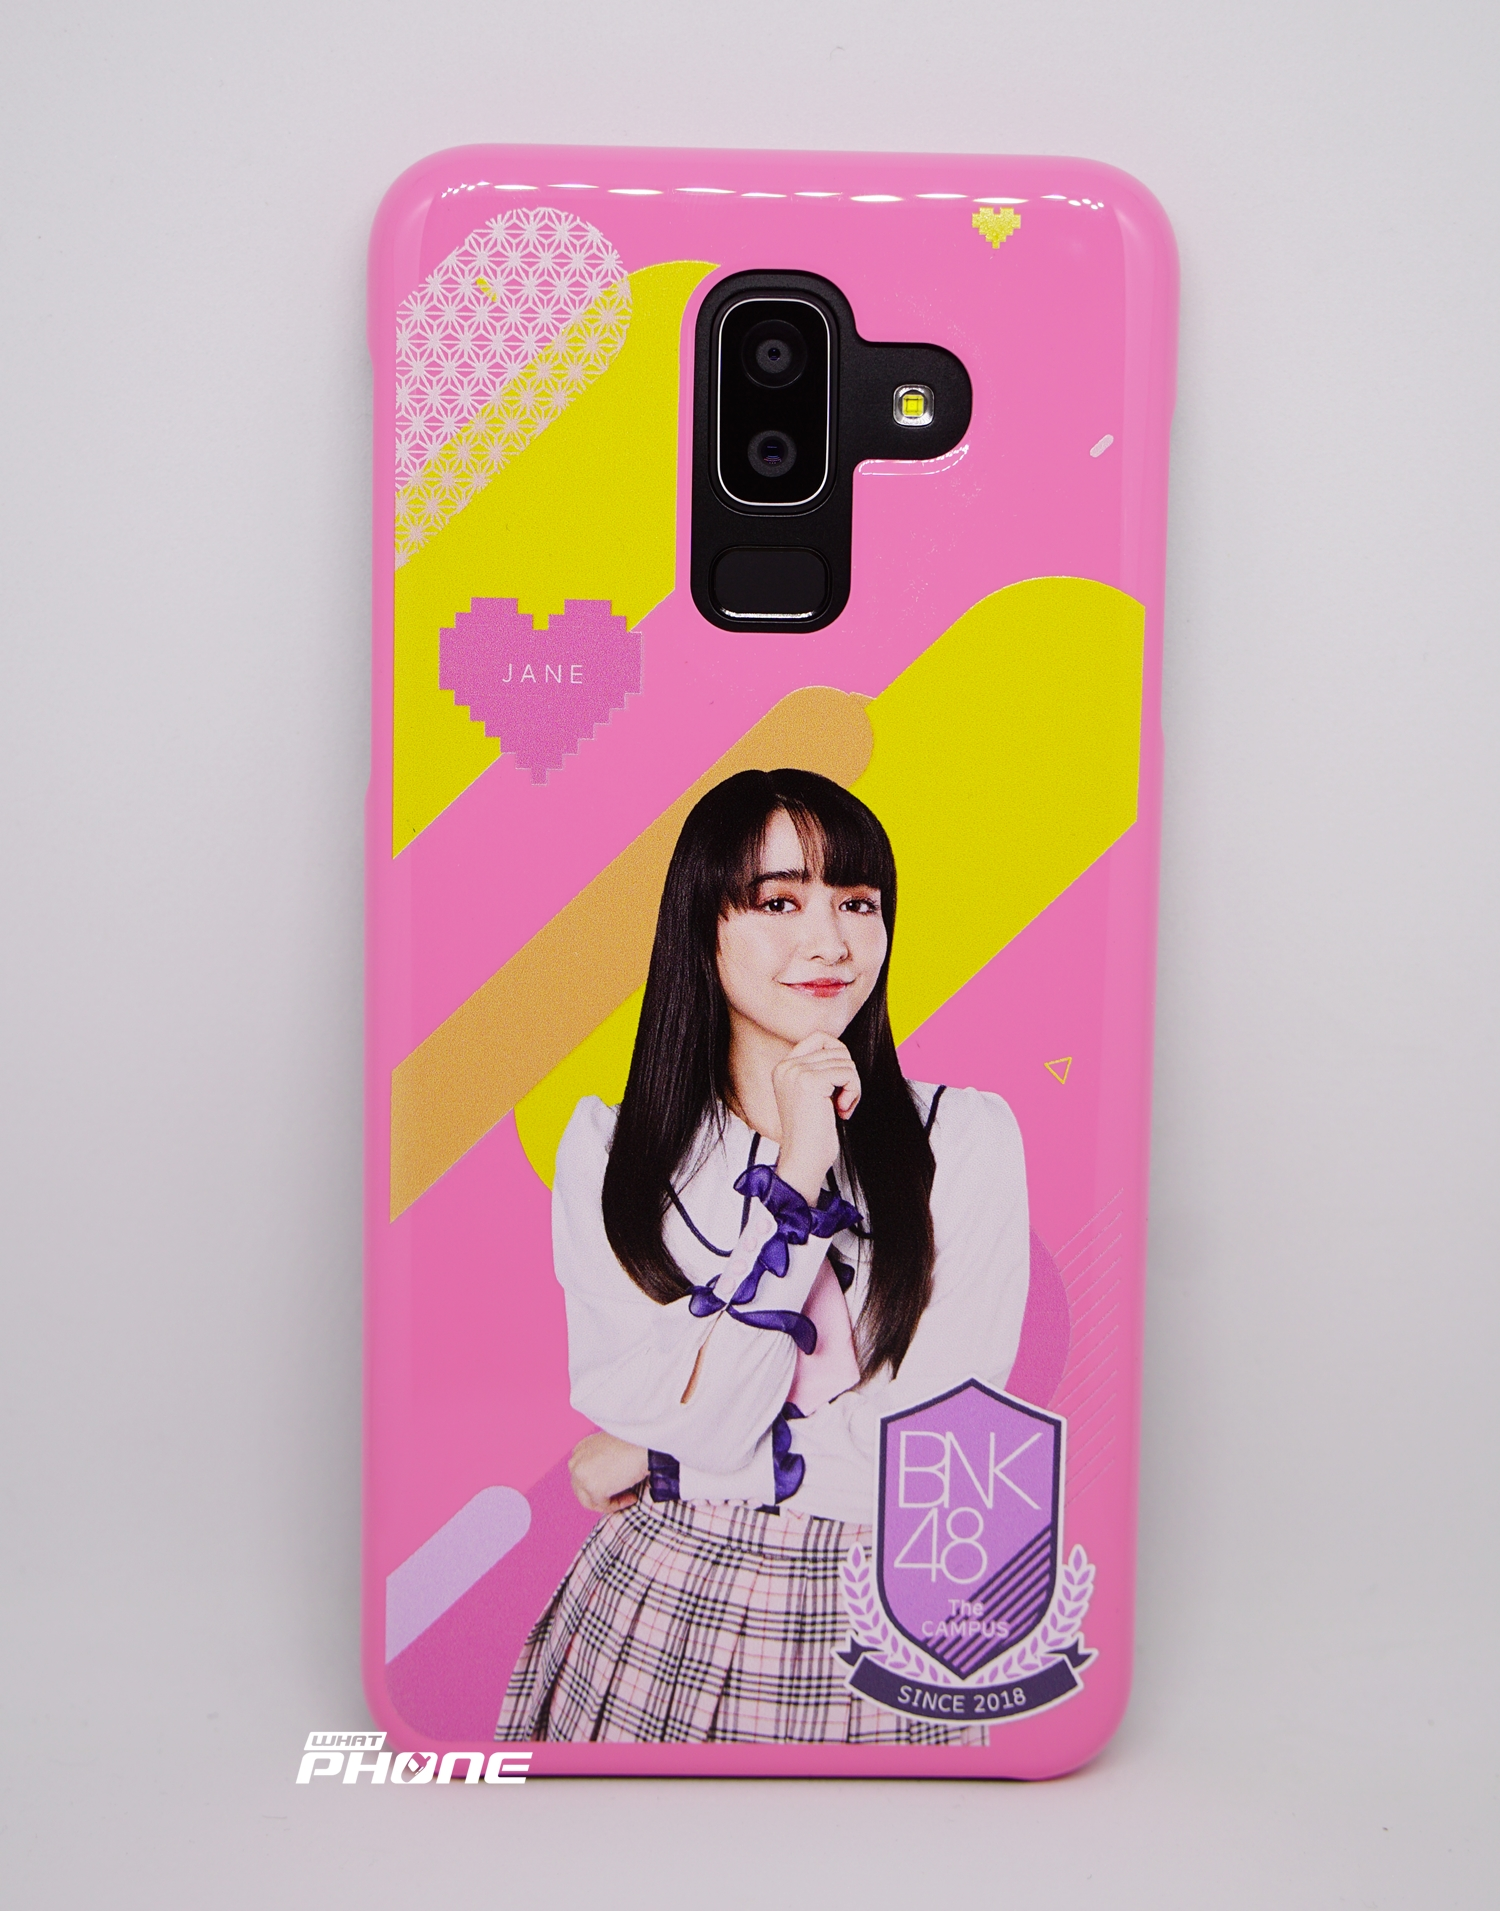 Samsung Galaxy J8 BNK48 BOXSET (12)